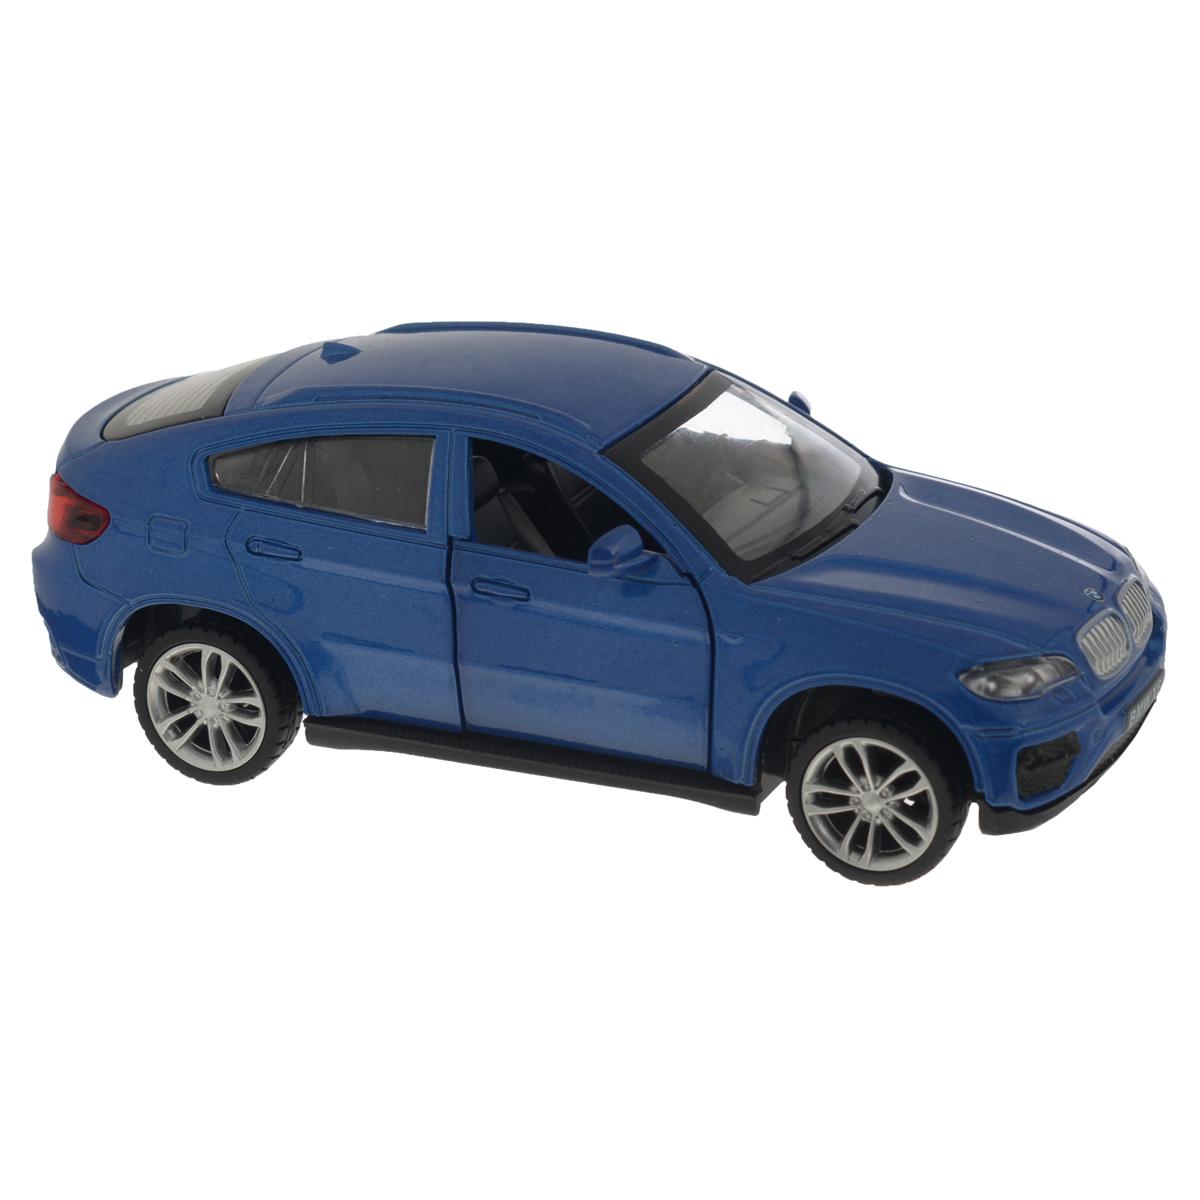 MSZ Модель автомобиля BMW X6 цвет синий umarex магазин для combat zone model 4 cqb cal 6 mm bb